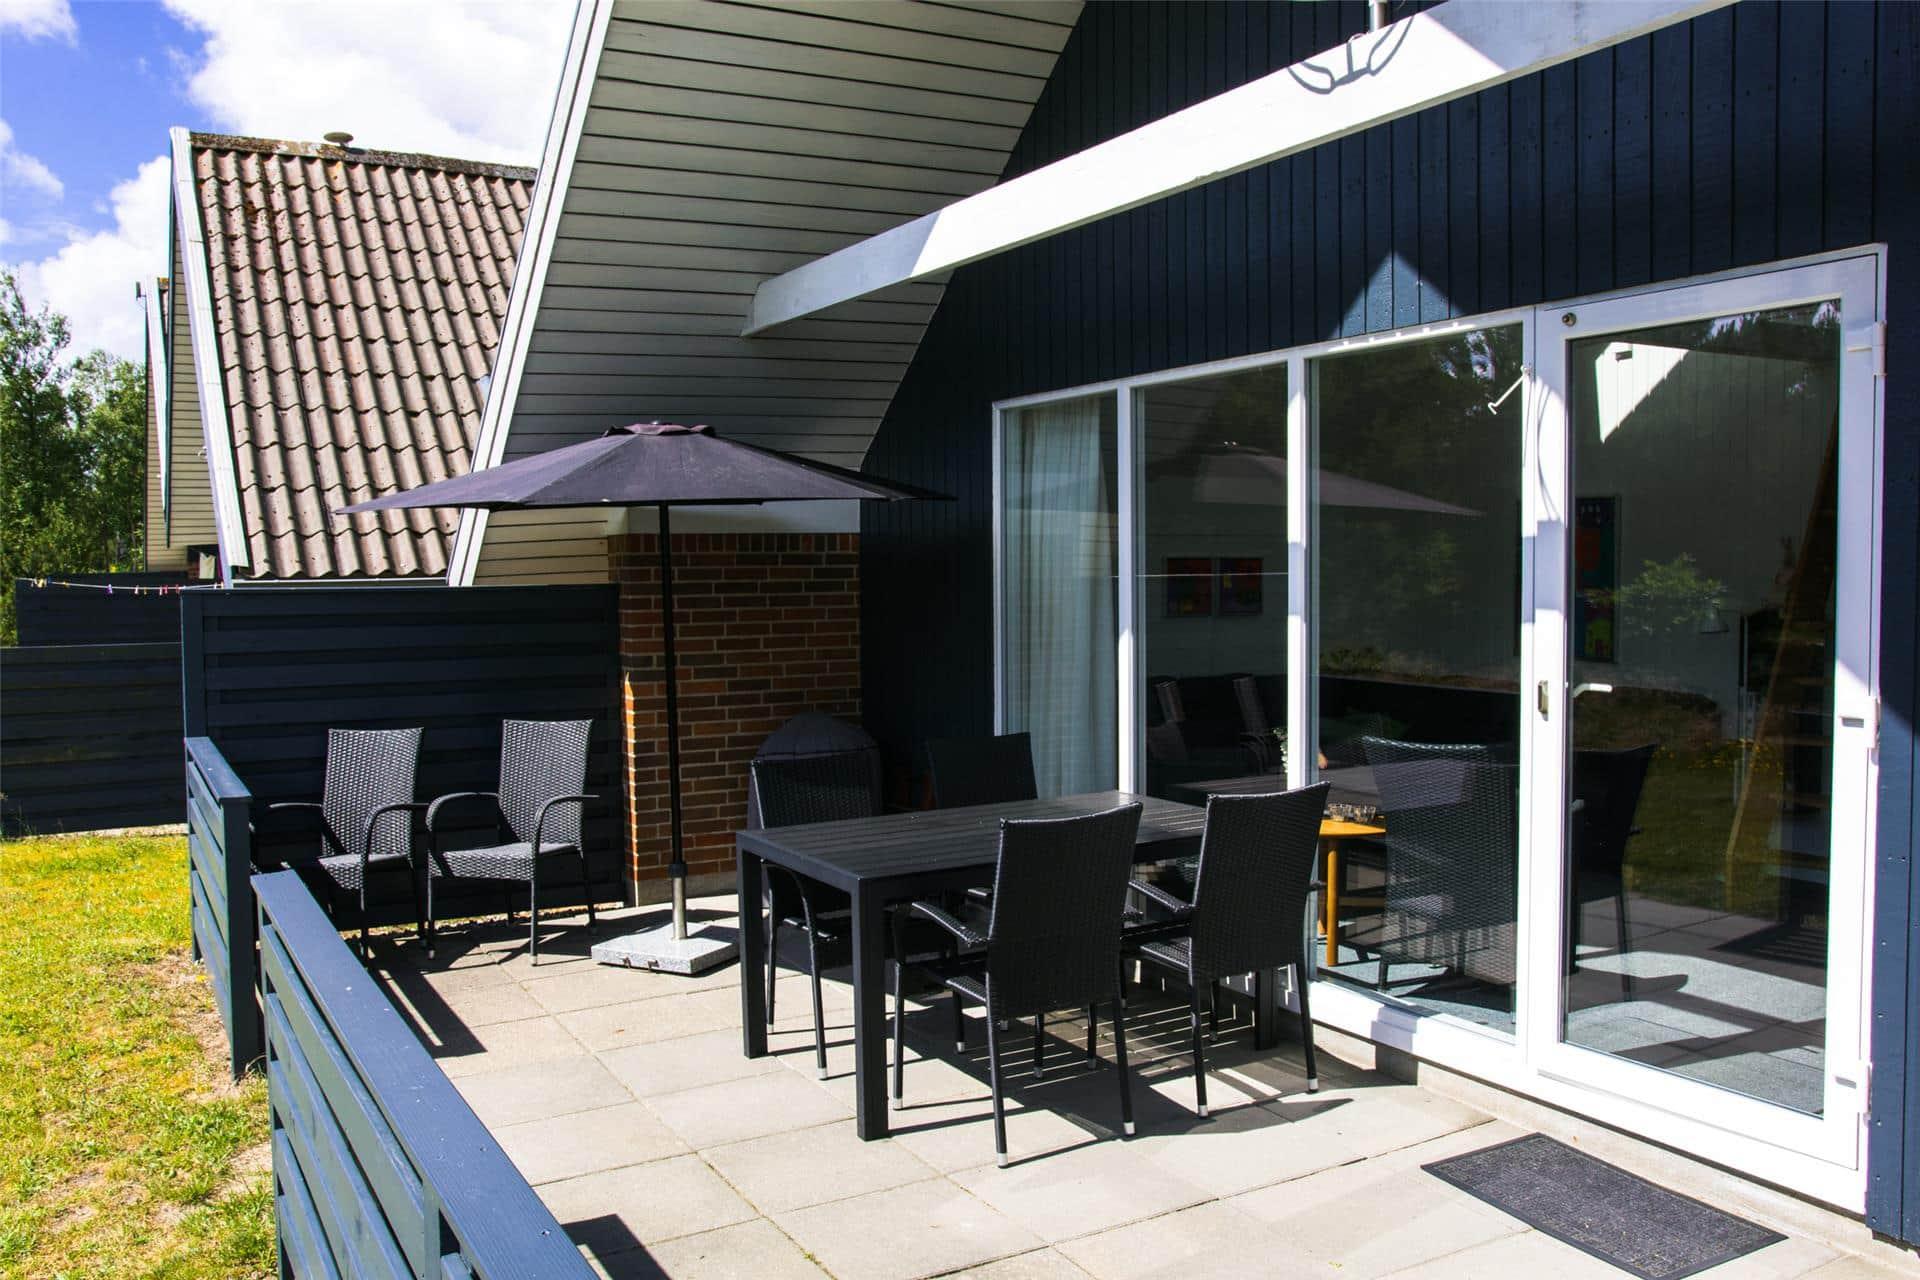 ferienhaus mit internet 0273 havneby r m. Black Bedroom Furniture Sets. Home Design Ideas